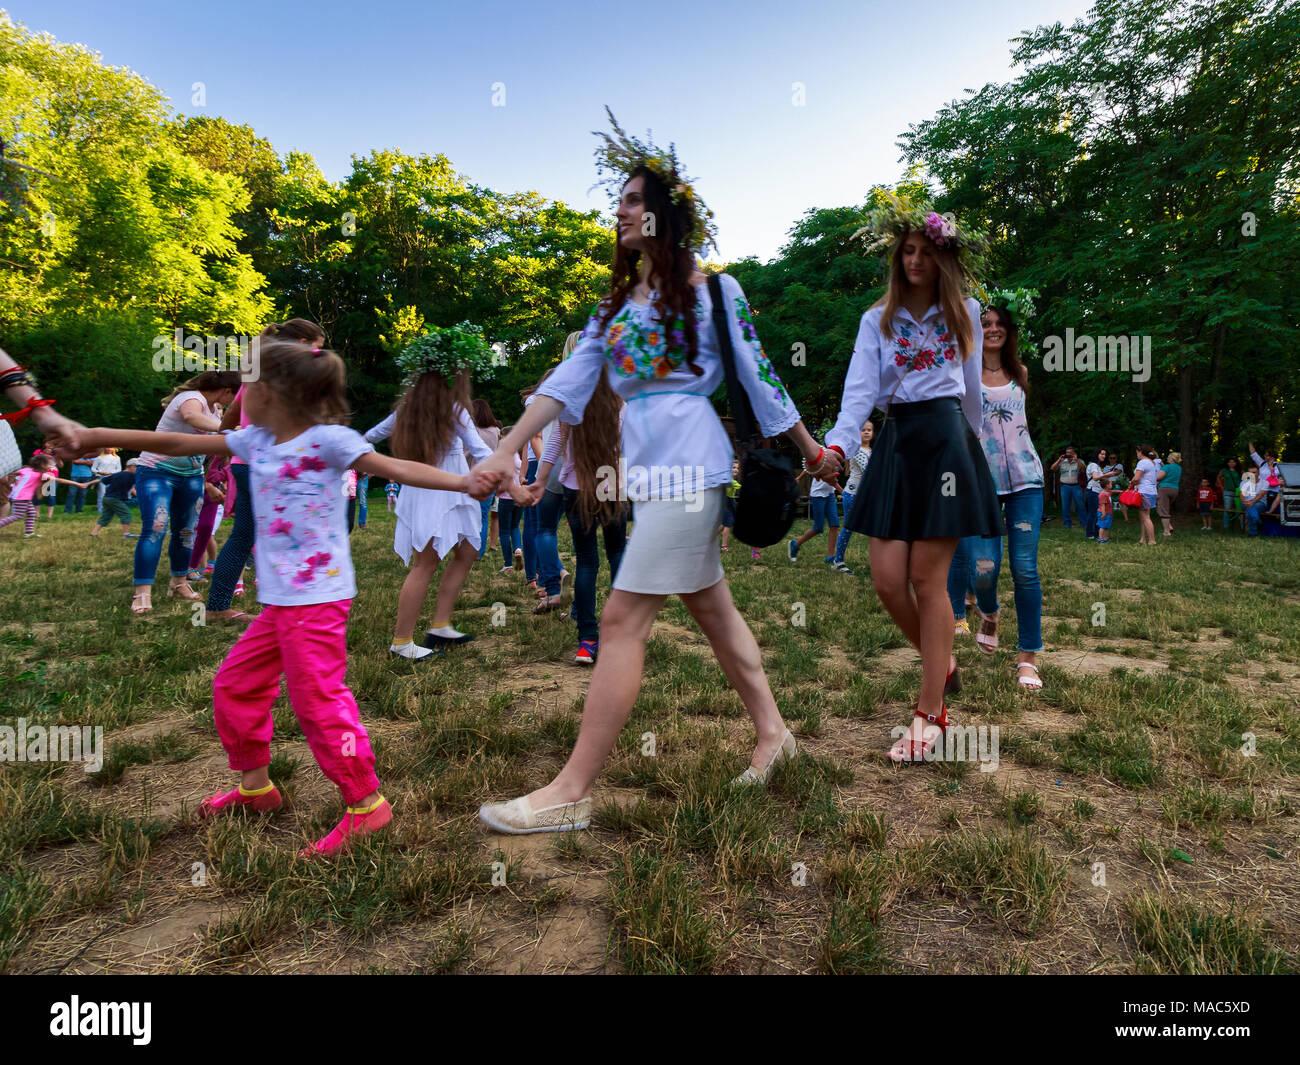 Uzhgorod, Ukraine - 07 Jul, 2016: Young female round dance on Ivana Kupala fest. Popular holiday in Slavic culture - Stock Image